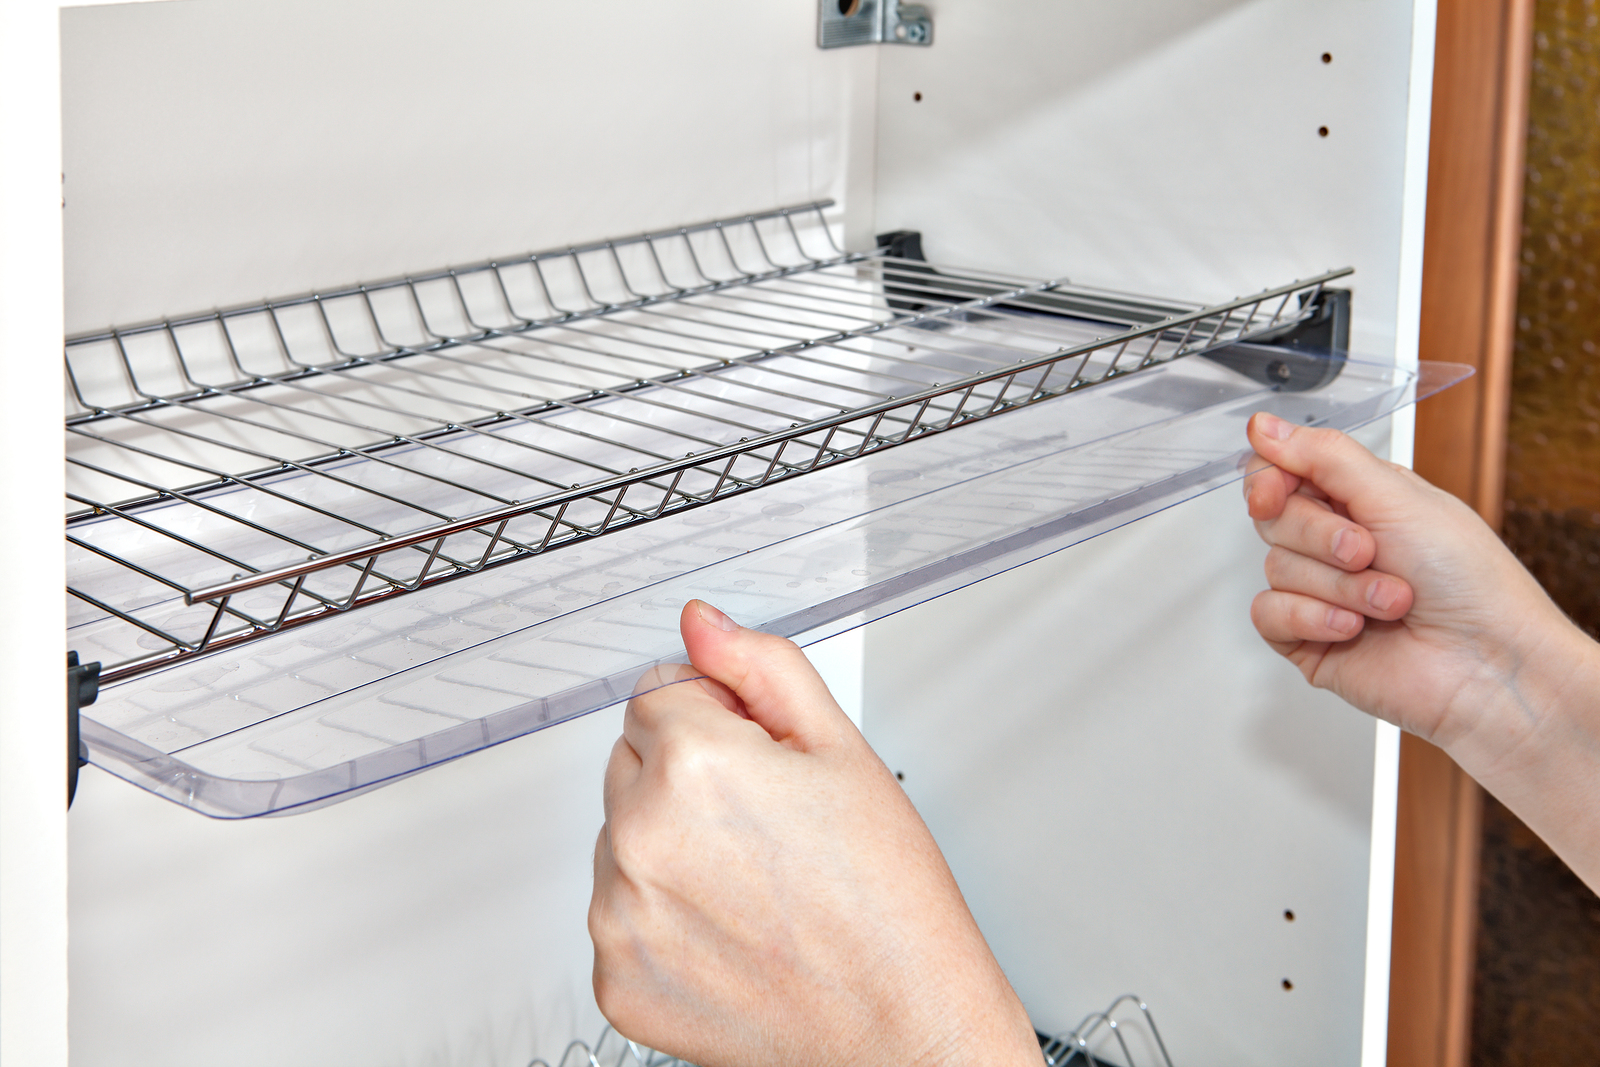 Installing shelf under kitchen cupboard with inside wire plate rack